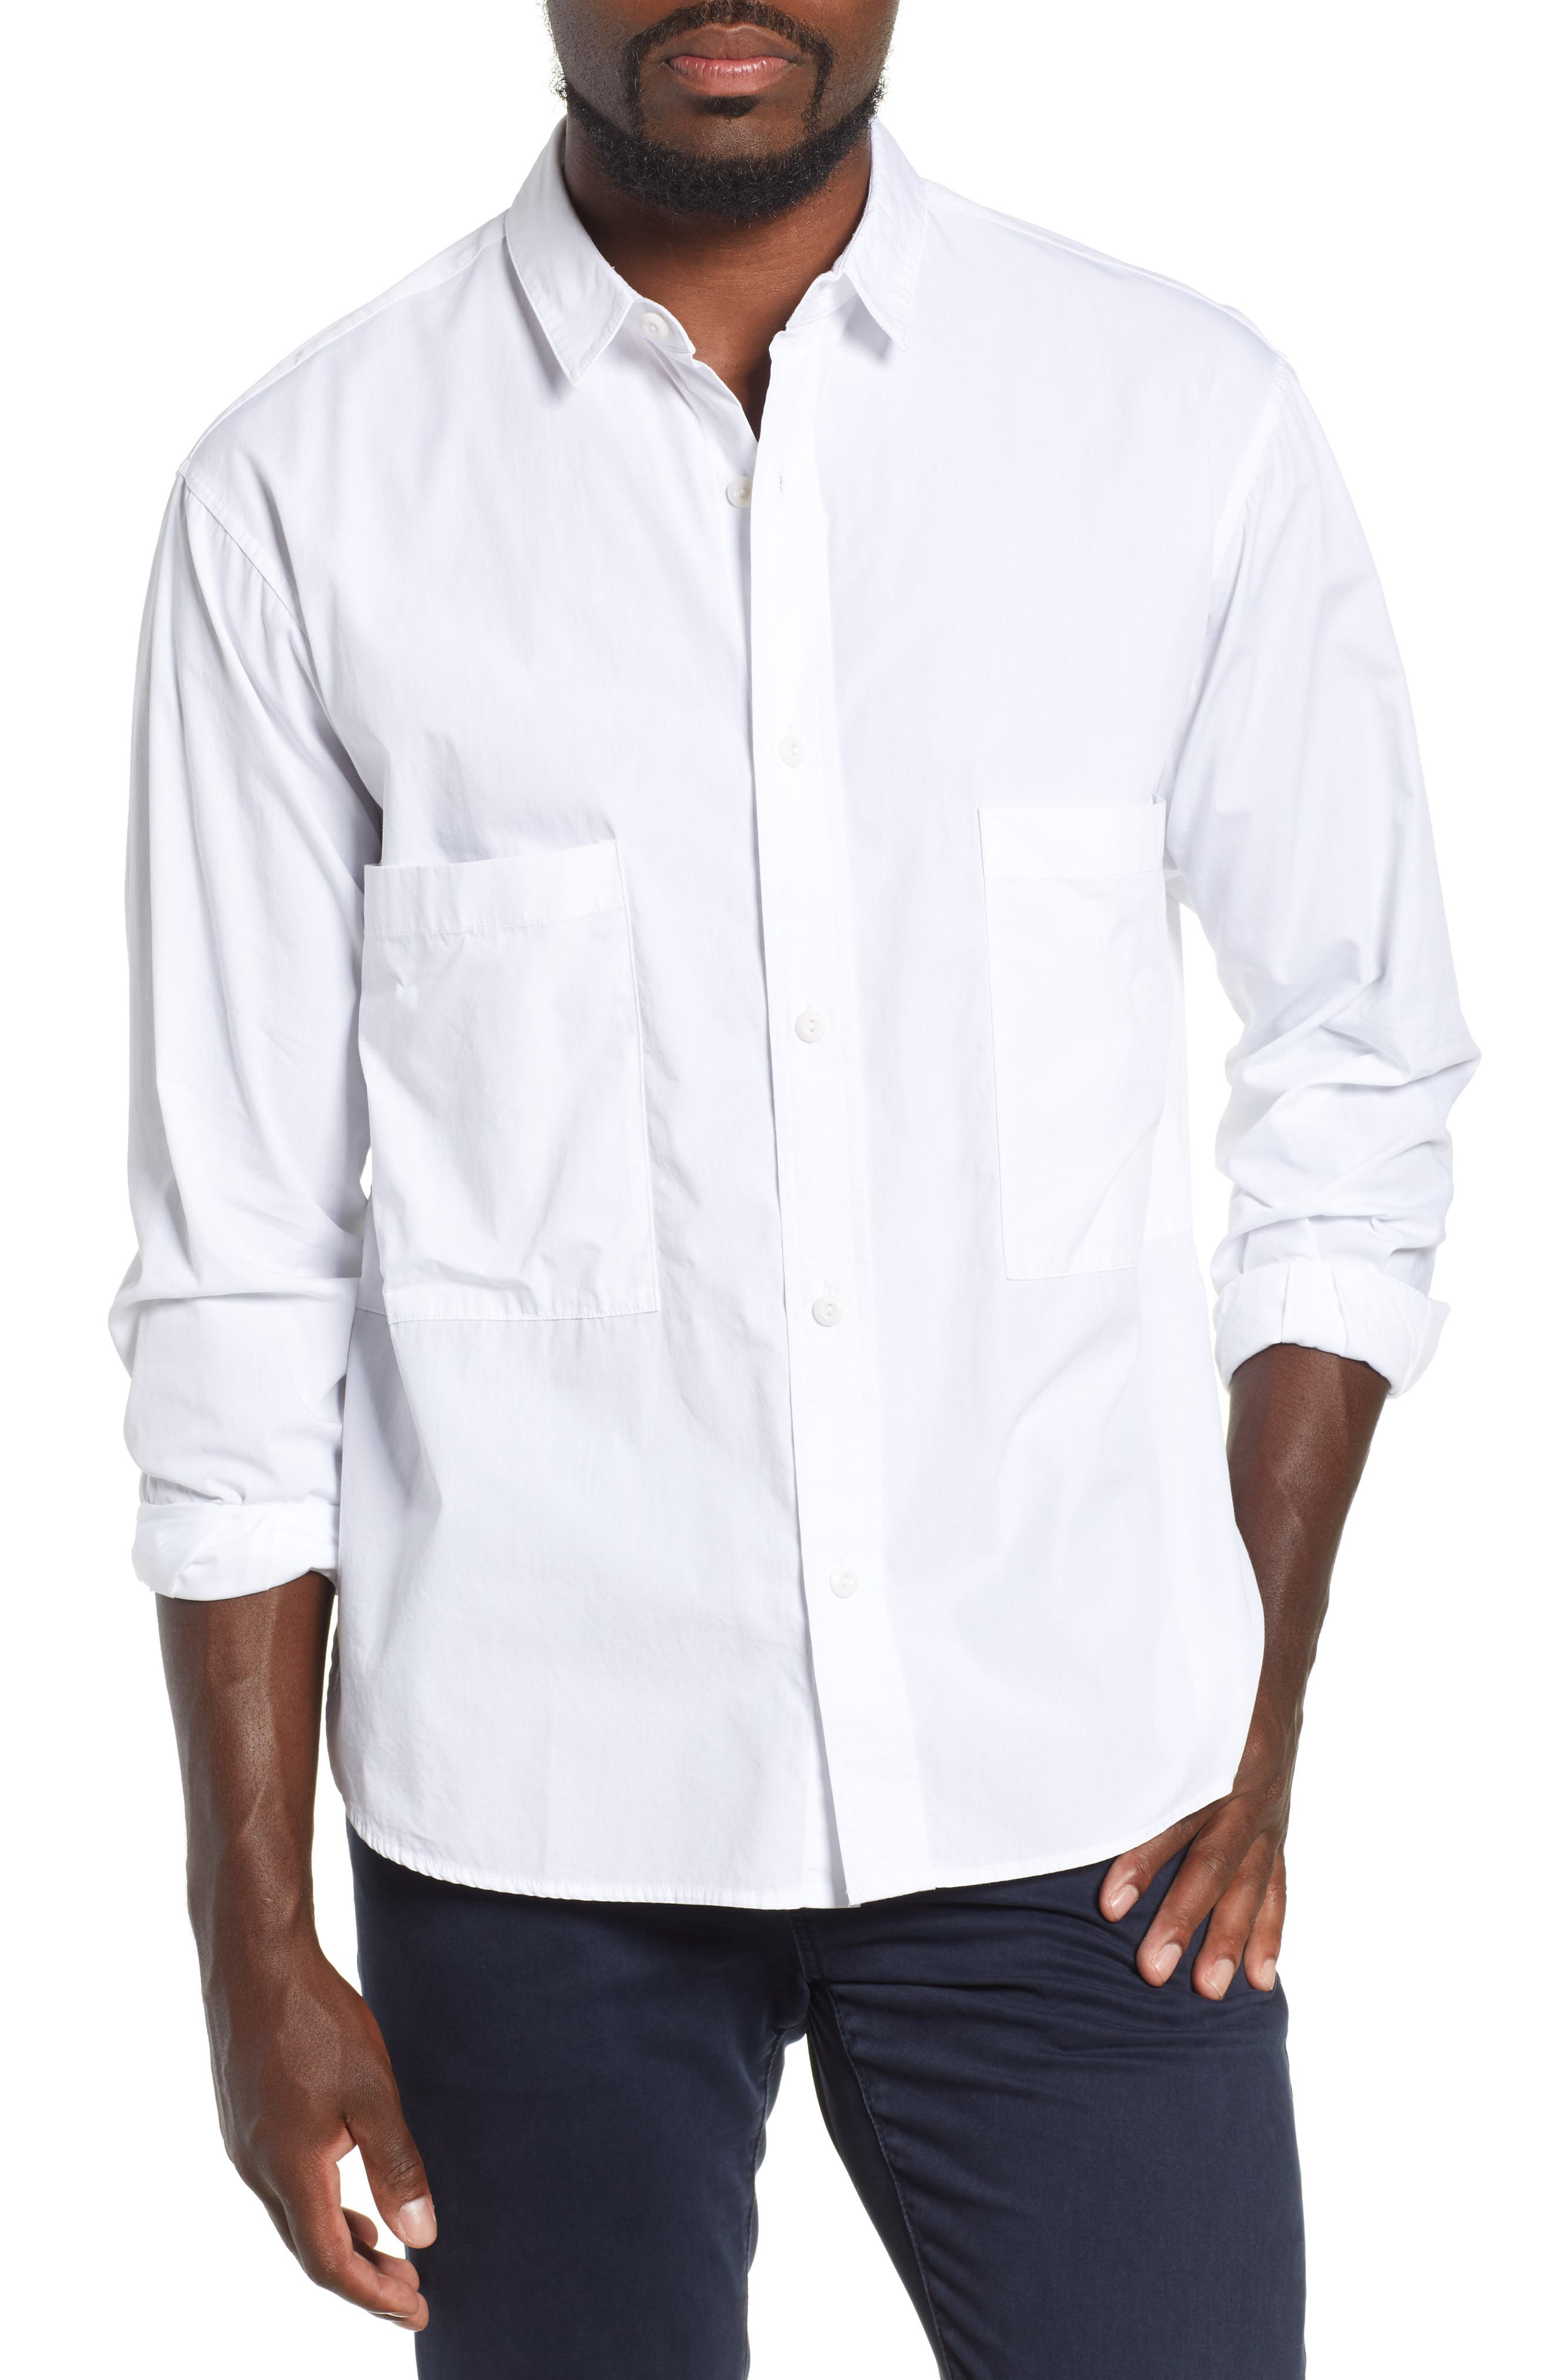 Shiro Oversize Pockets Regular Fit Sport Shirt,                             Main thumbnail 1, color,                             TRUE WHITE